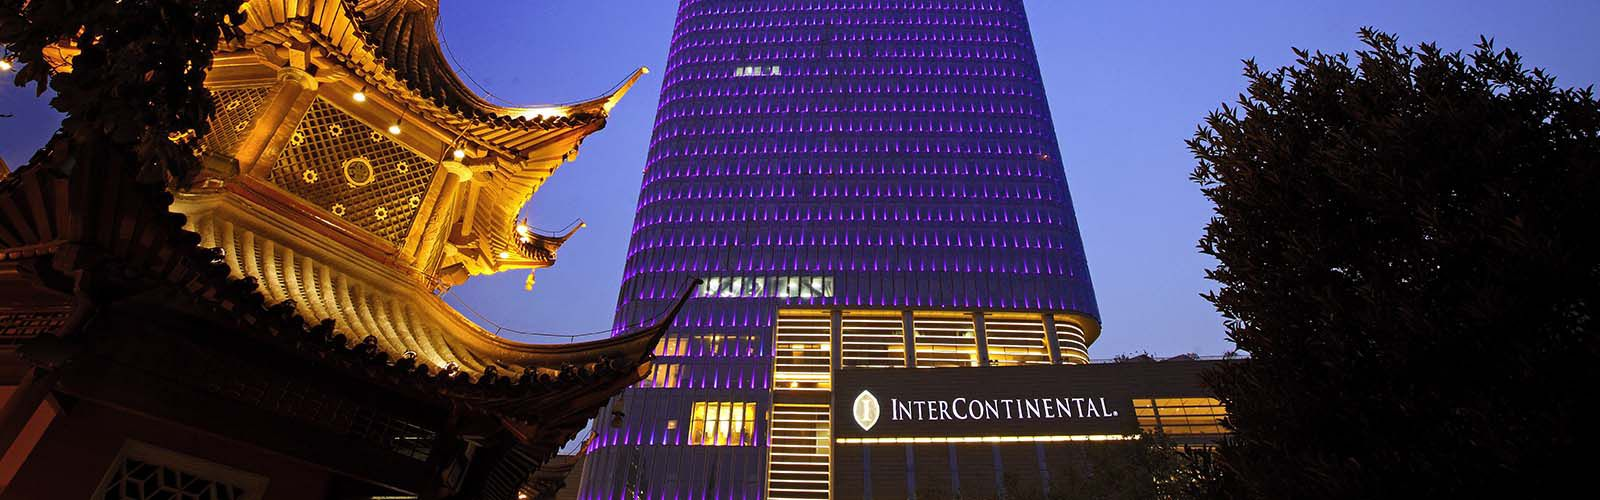 Hotel Reviews Hotel Deals Amp Hotels Near Me Ihg